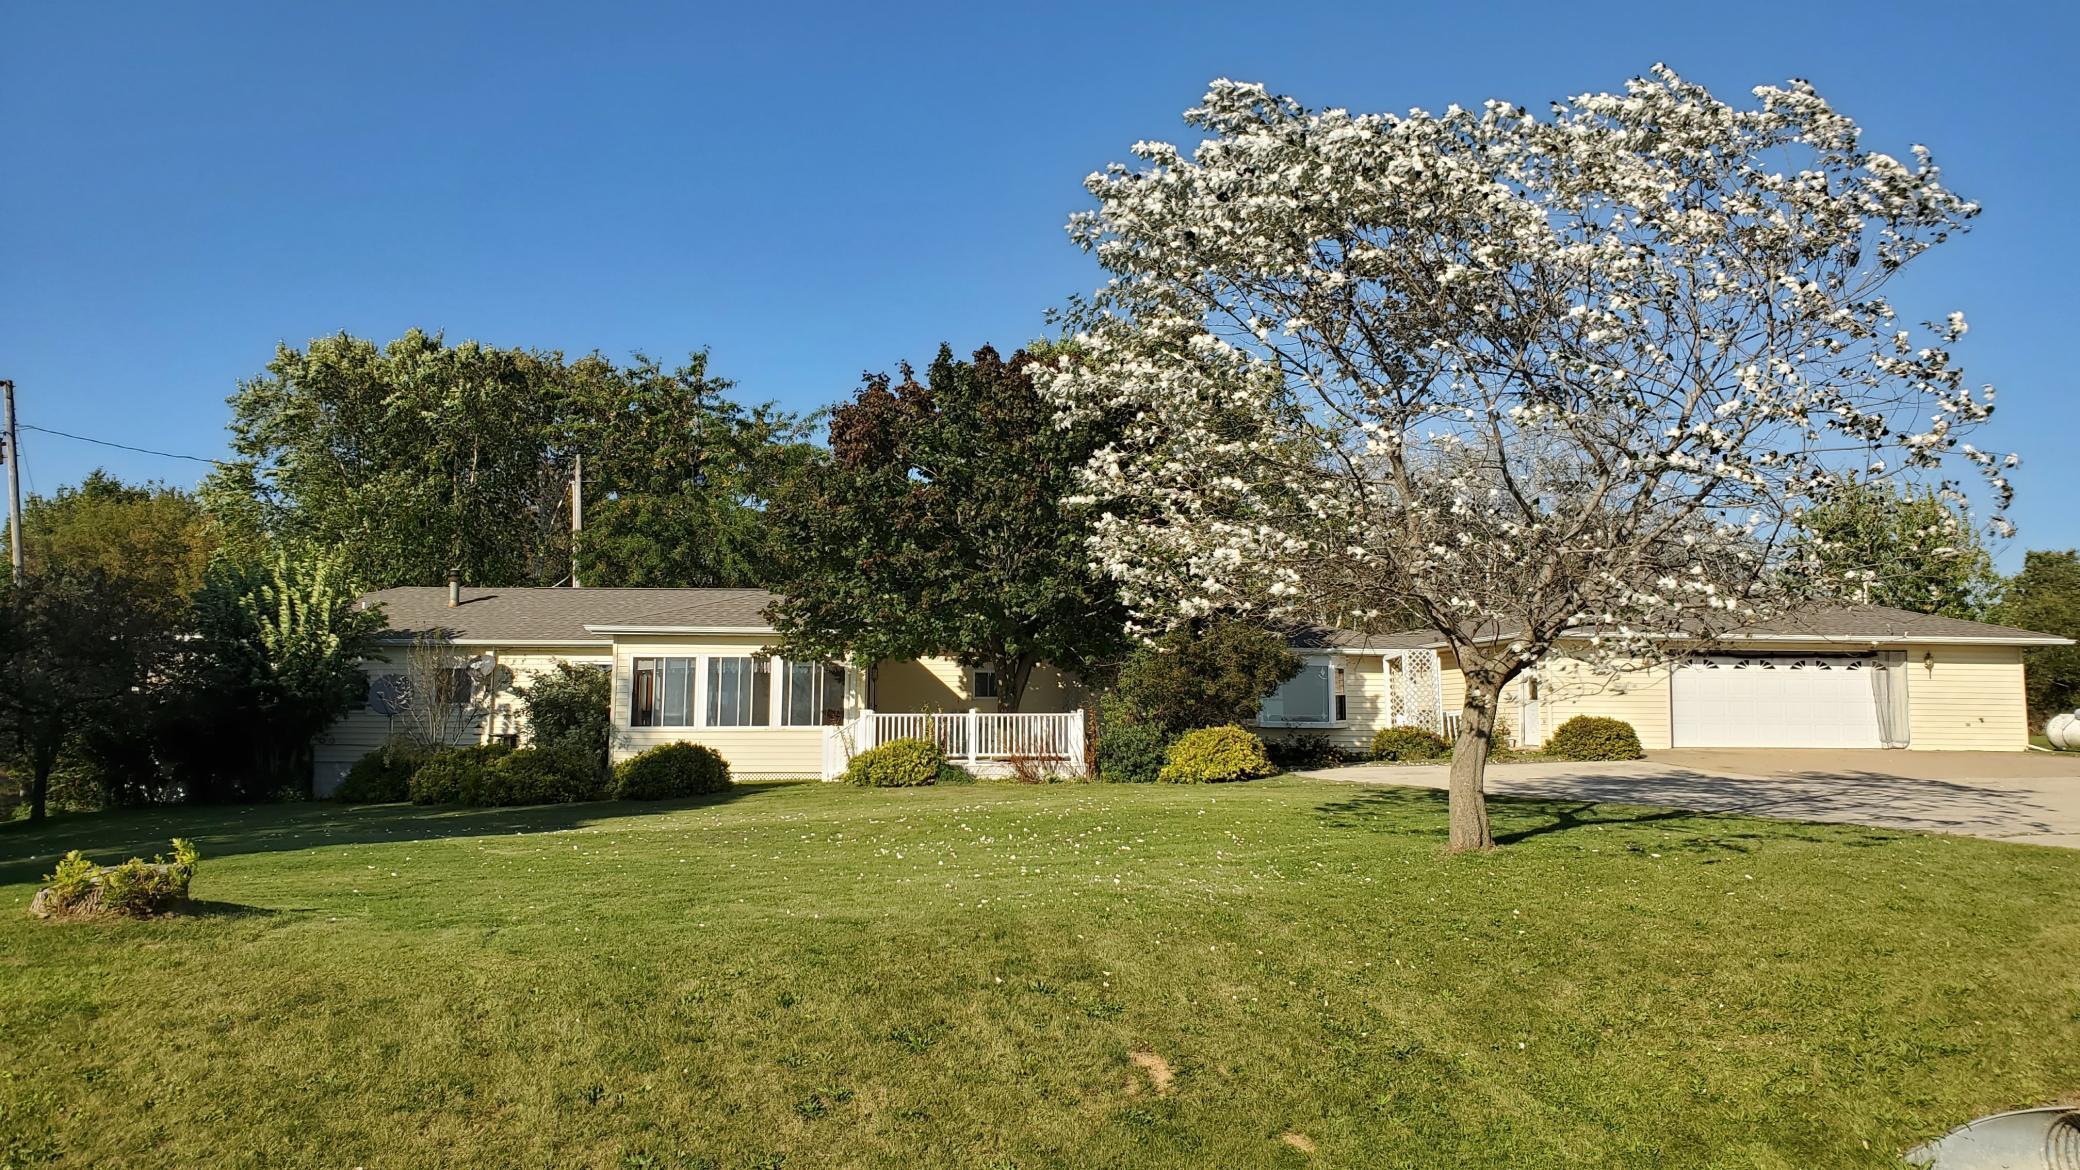 4530 County 3 Property Photo